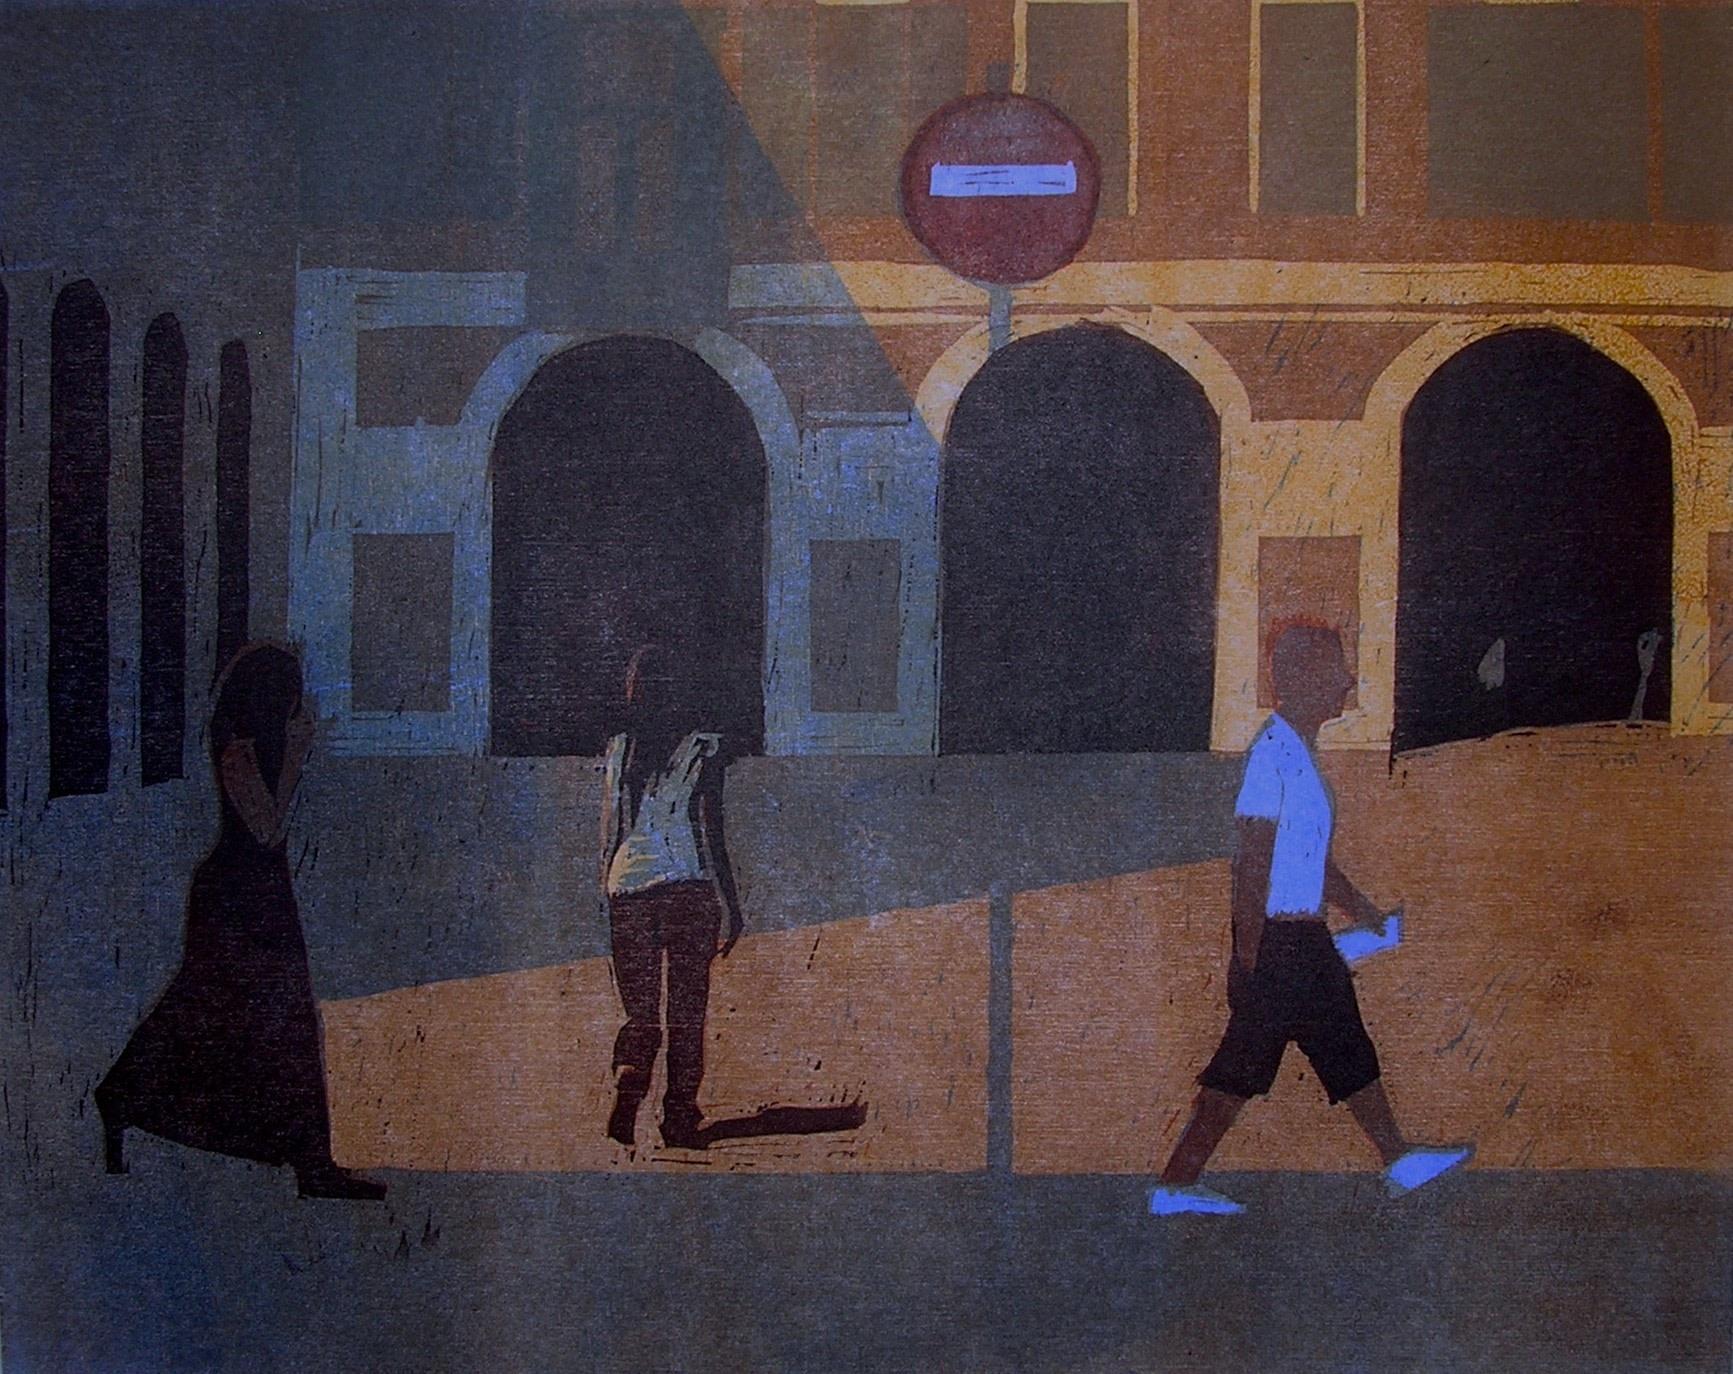 "<span class=""link fancybox-details-link""><a href=""/artists/35-adrian-bartlett-re/works/9819/"">View Detail Page</a></span><div class=""artist""><span class=""artist""><strong>Adrian Bartlett RE</strong></span></div><div class=""title""><em>Place Garibaldi</em></div><div class=""medium"">woodcut</div>"